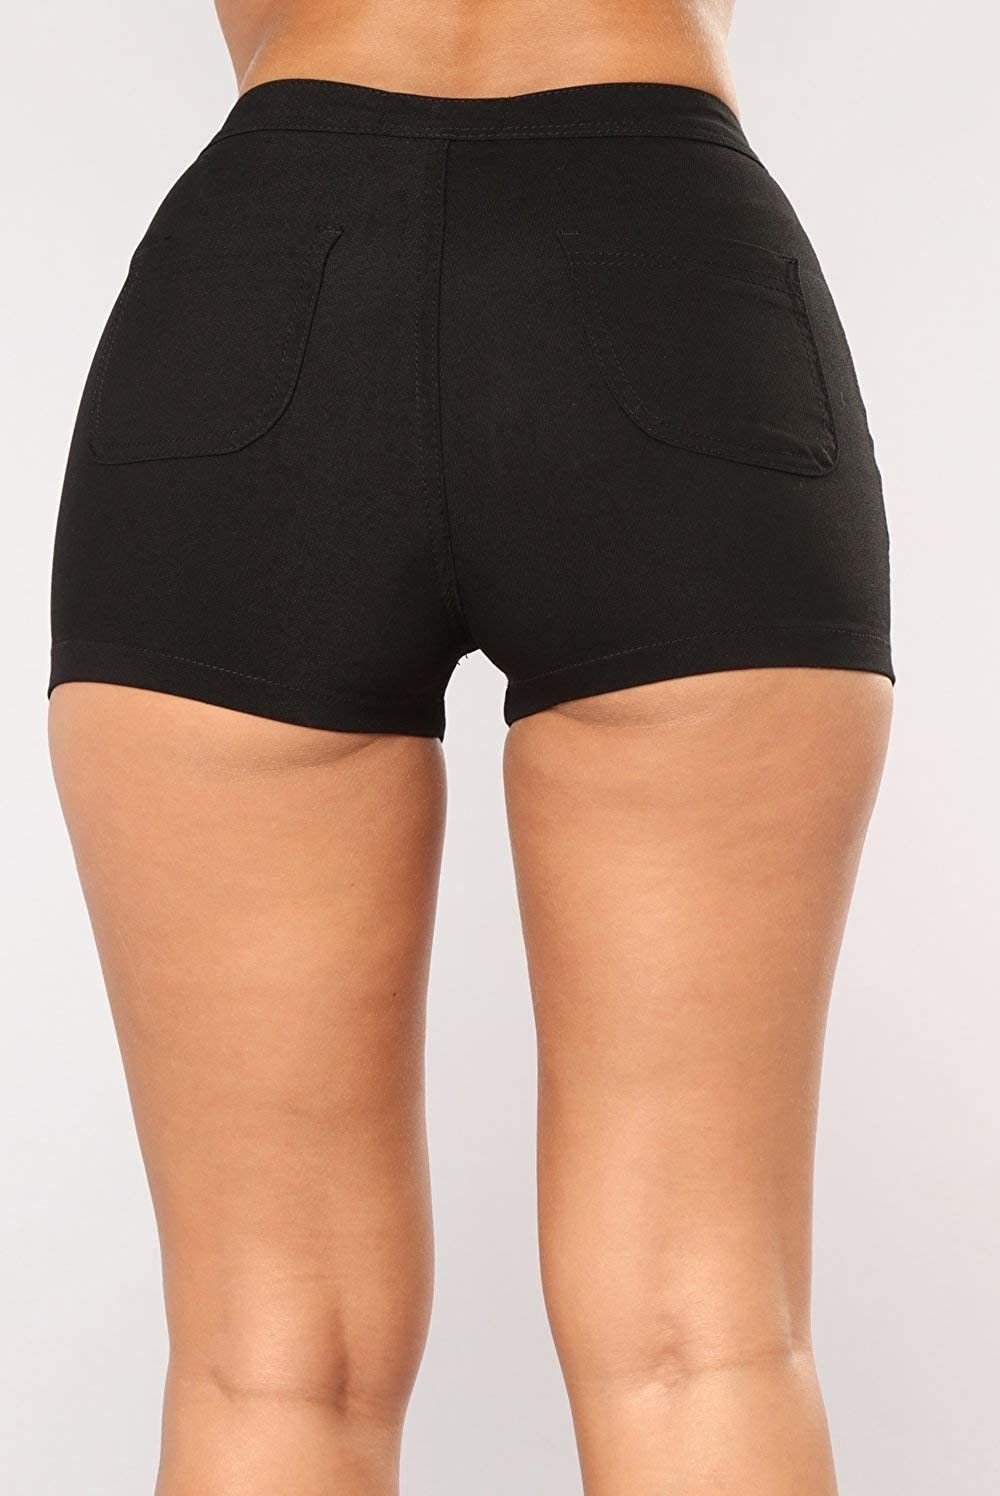 Zimaes-Women Washed Bodysuit Casual High Waist Mini Jean Denim Shorts